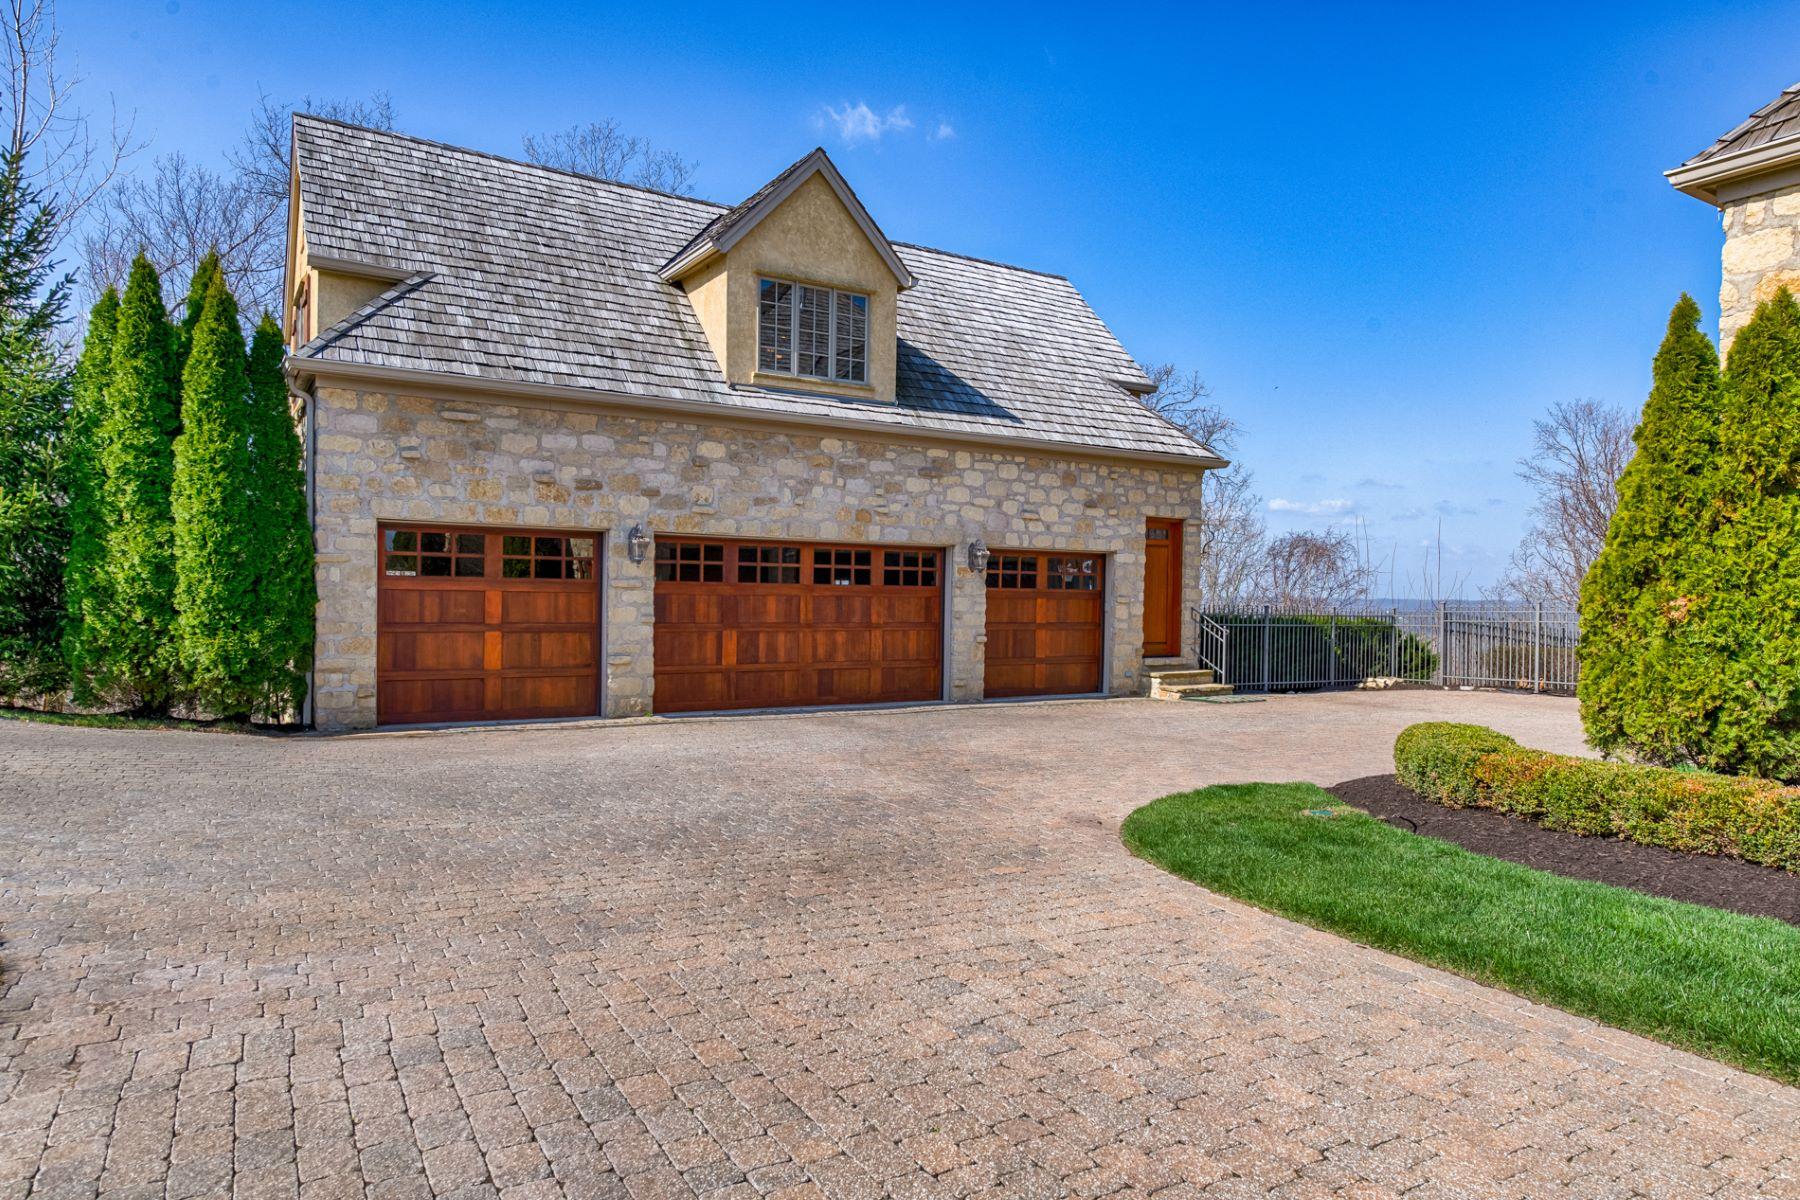 Additional photo for property listing at Talon Ct 2271 Talon Ct St. Albans, Missouri 63073 United States